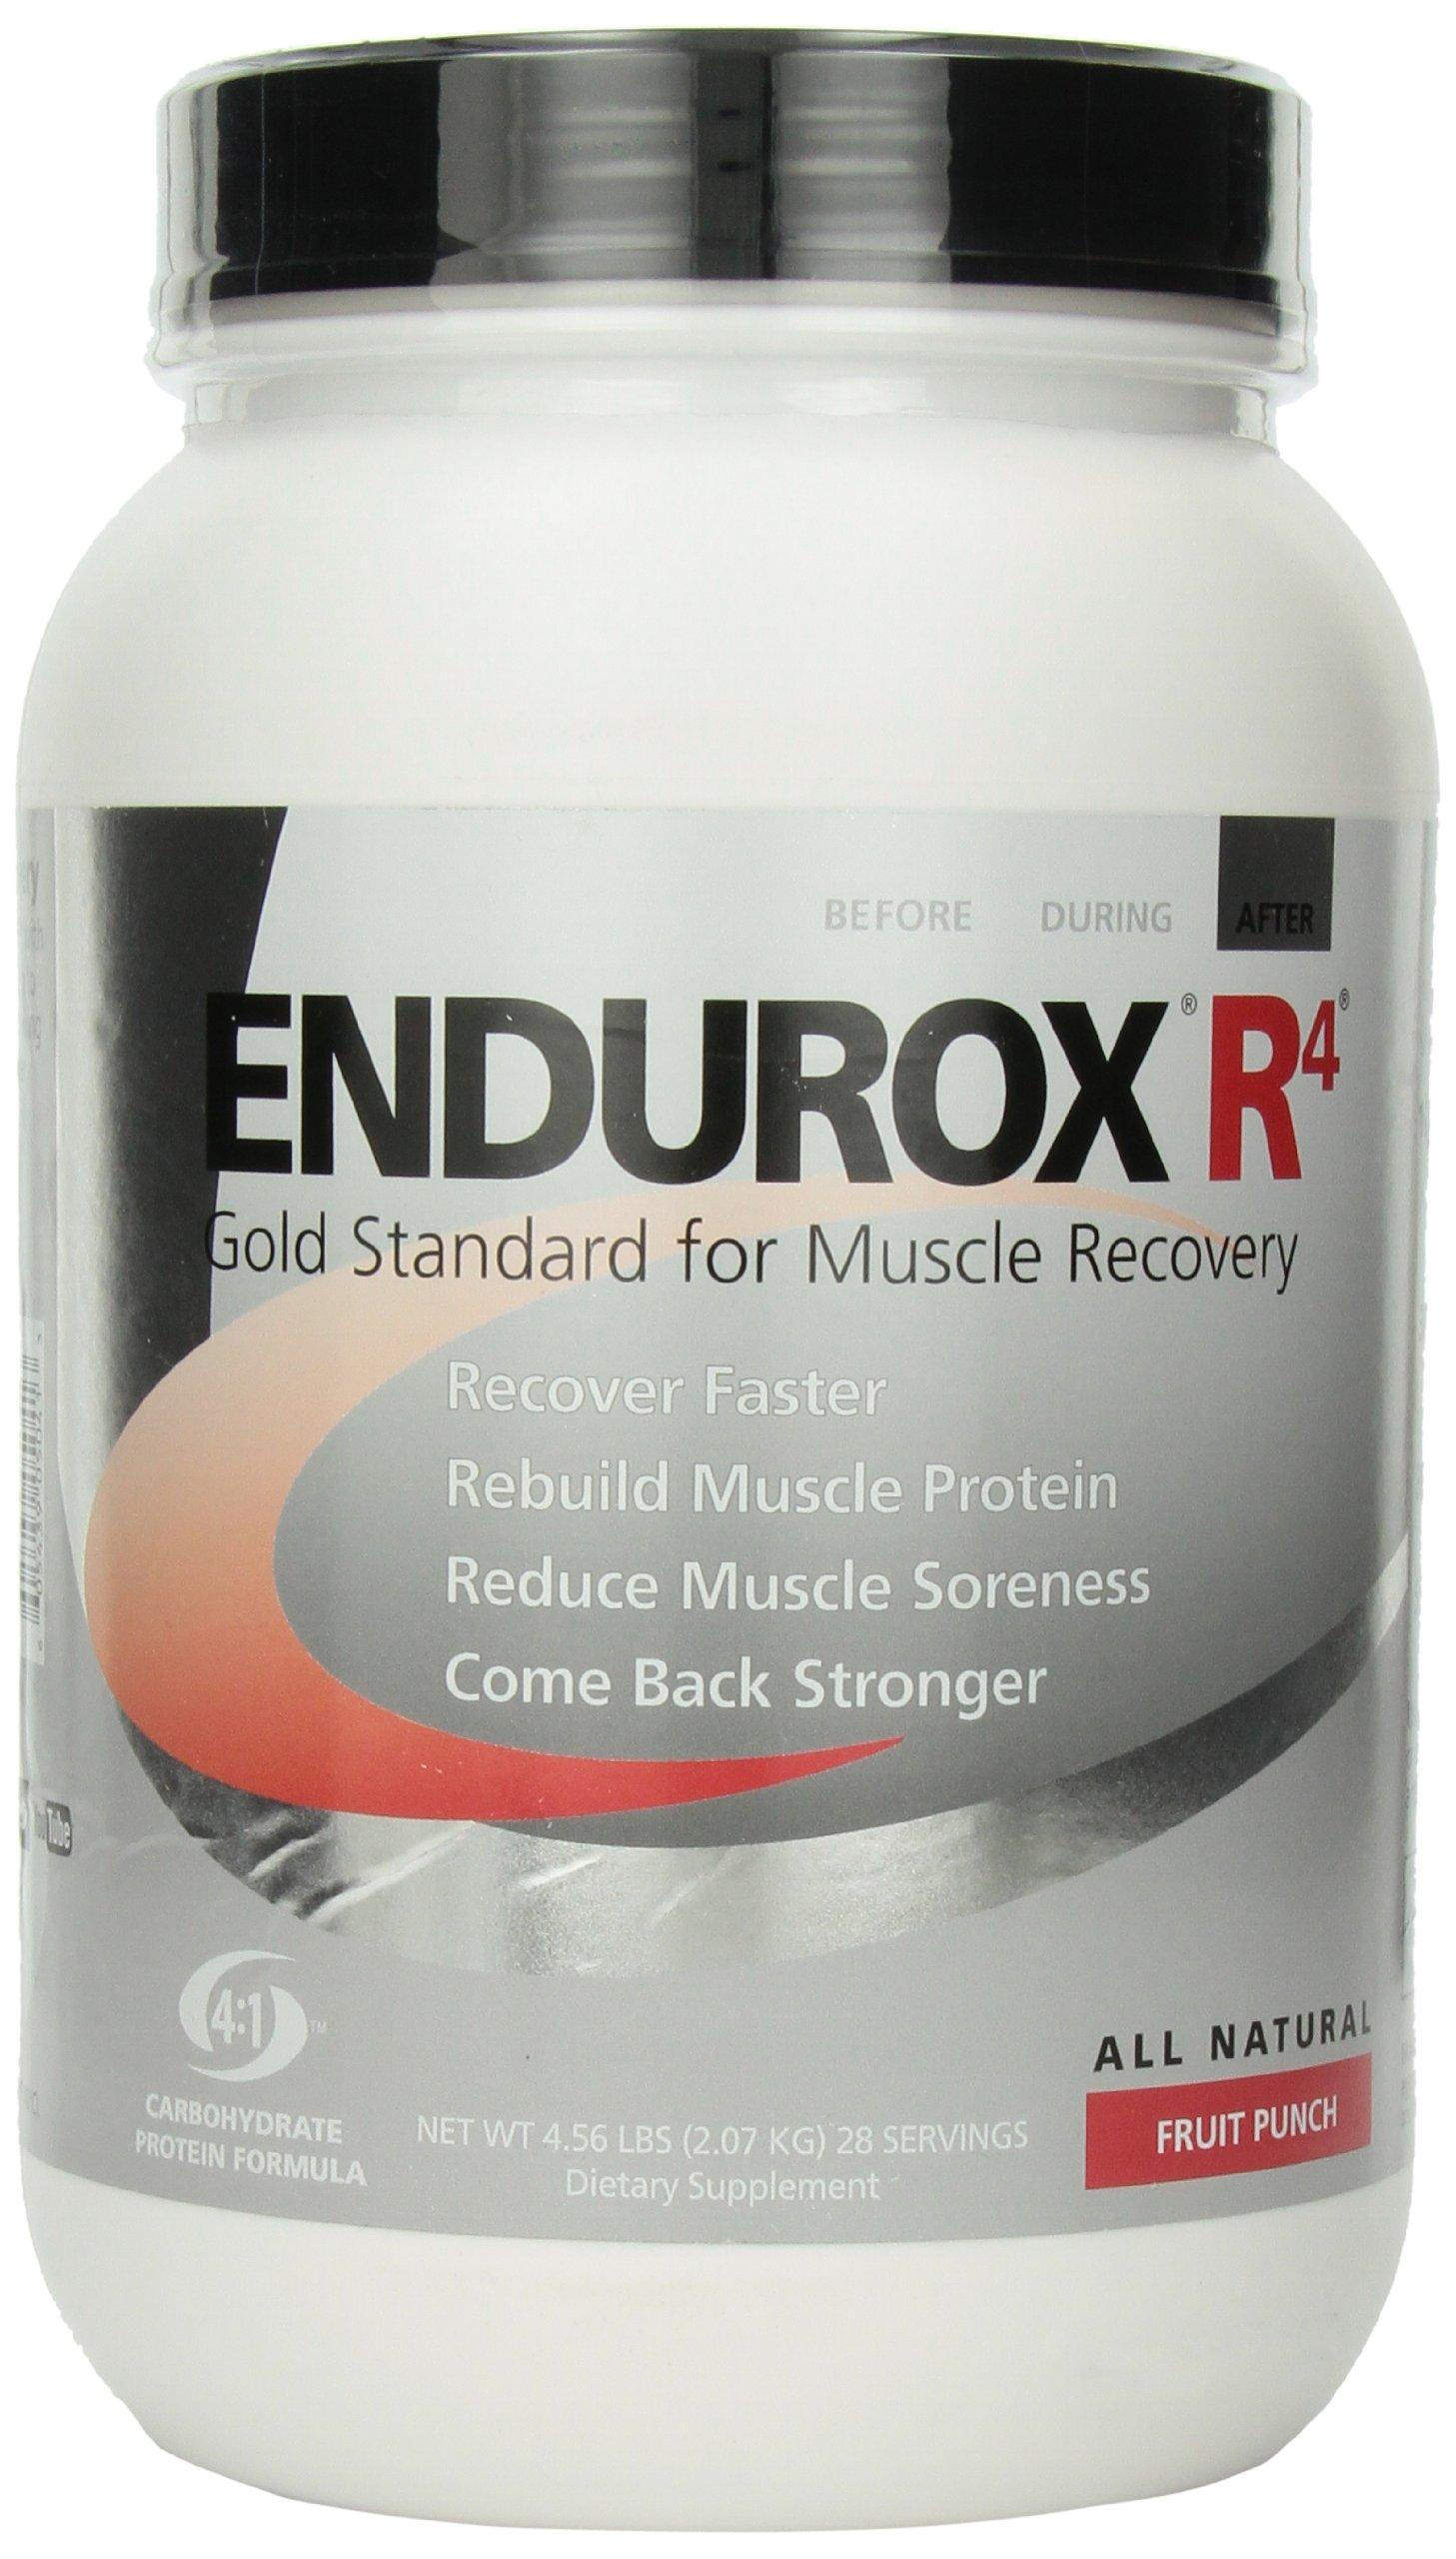 Pacific Health  Endurox R4, Fruit Punch, Net Wt. 4.56 lb., 28 serving